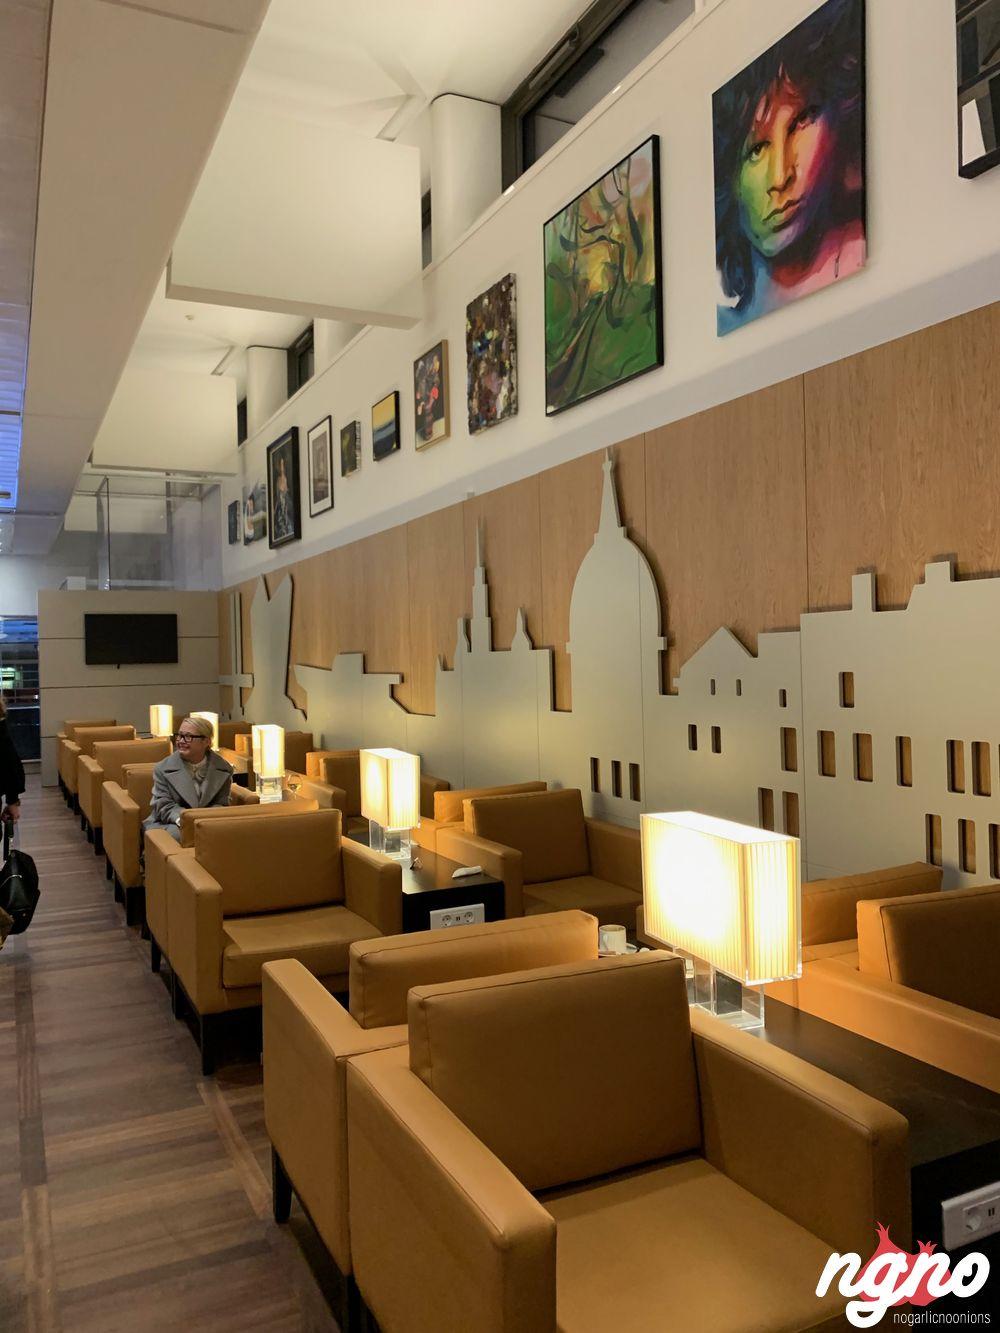 prime-class-lounge-airport-copenhagen-nogarlicnoonions-172019-02-24-11-07-55